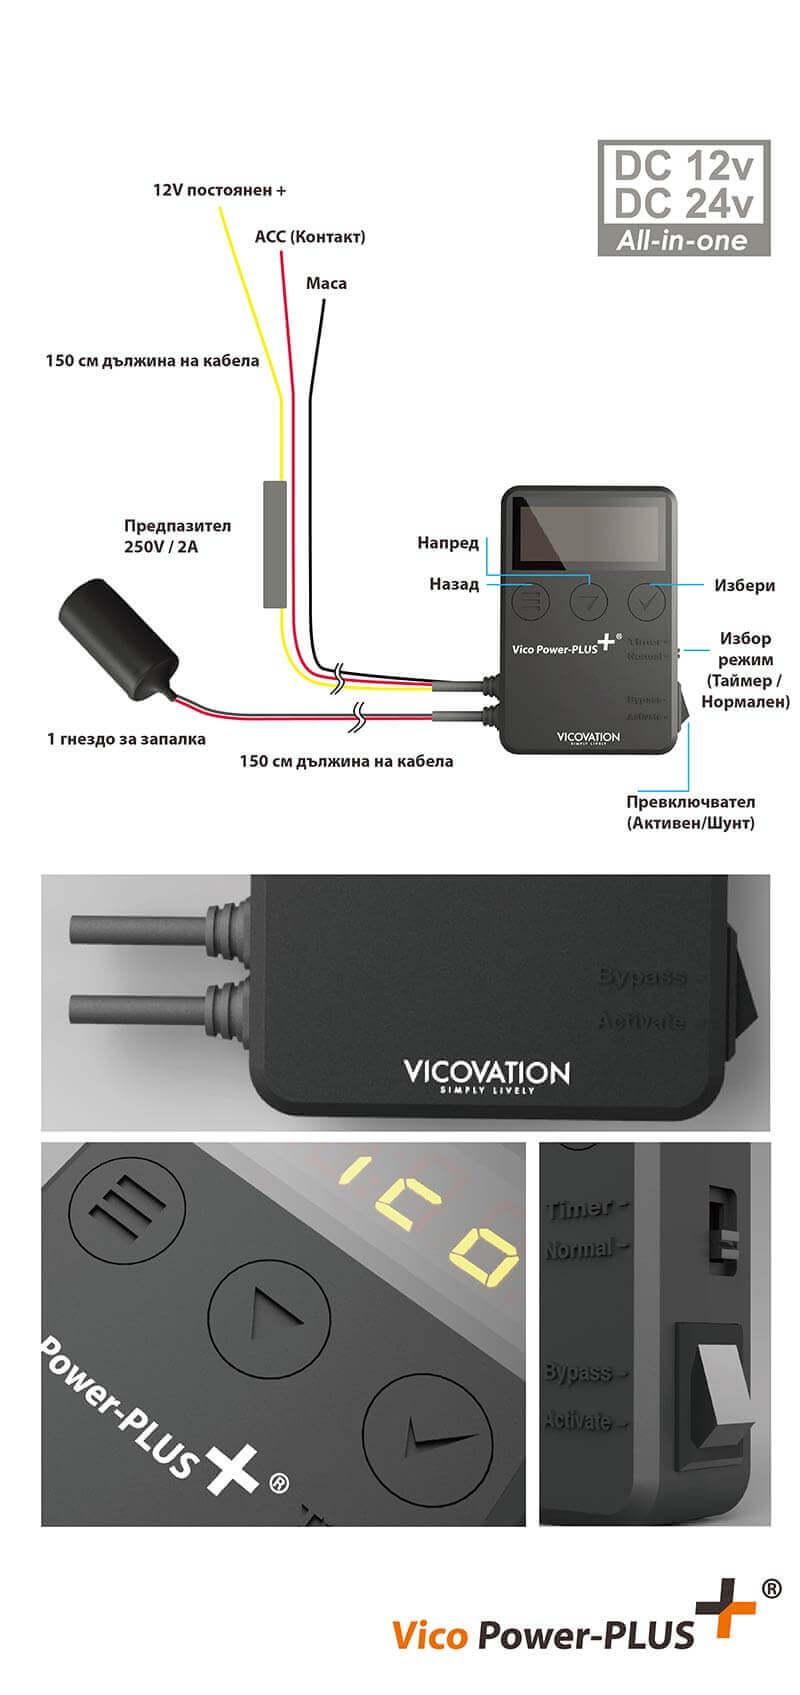 vico-power-plus-specifikacii4